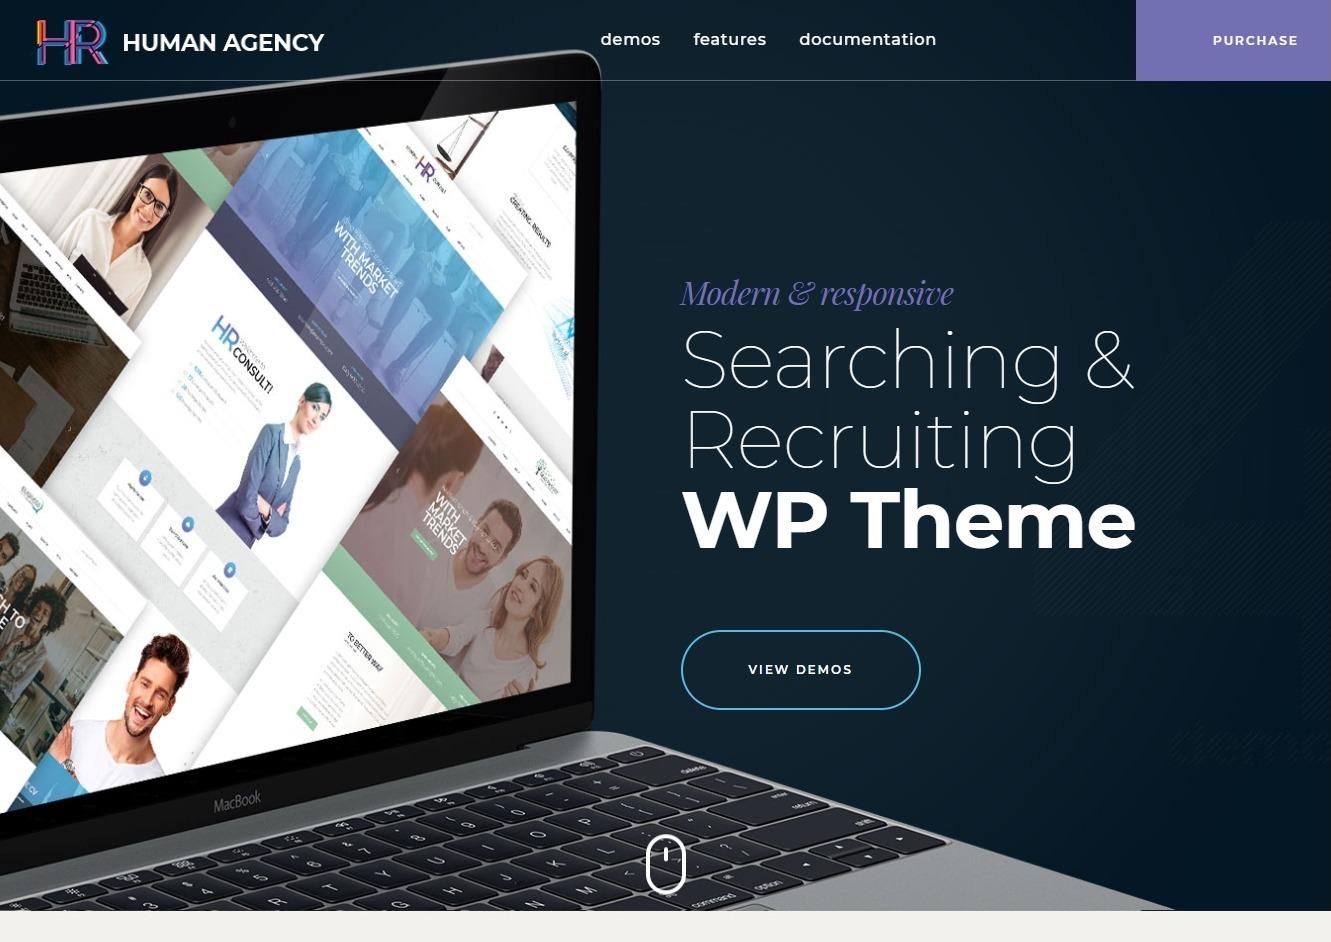 HR Human Agency Human Resources WordPress Theme